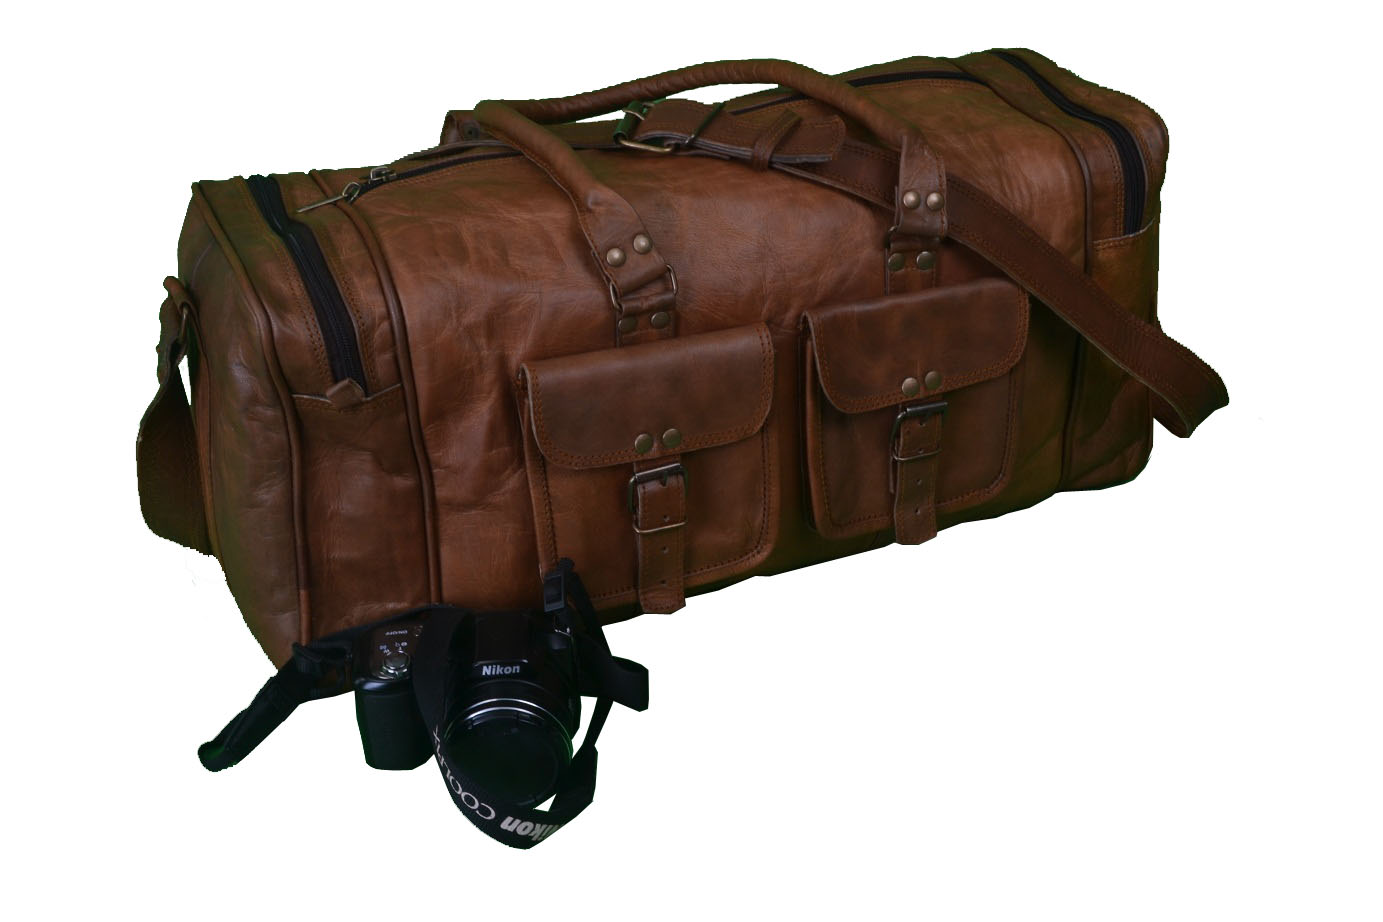 Choosing the Best Duffle Bag